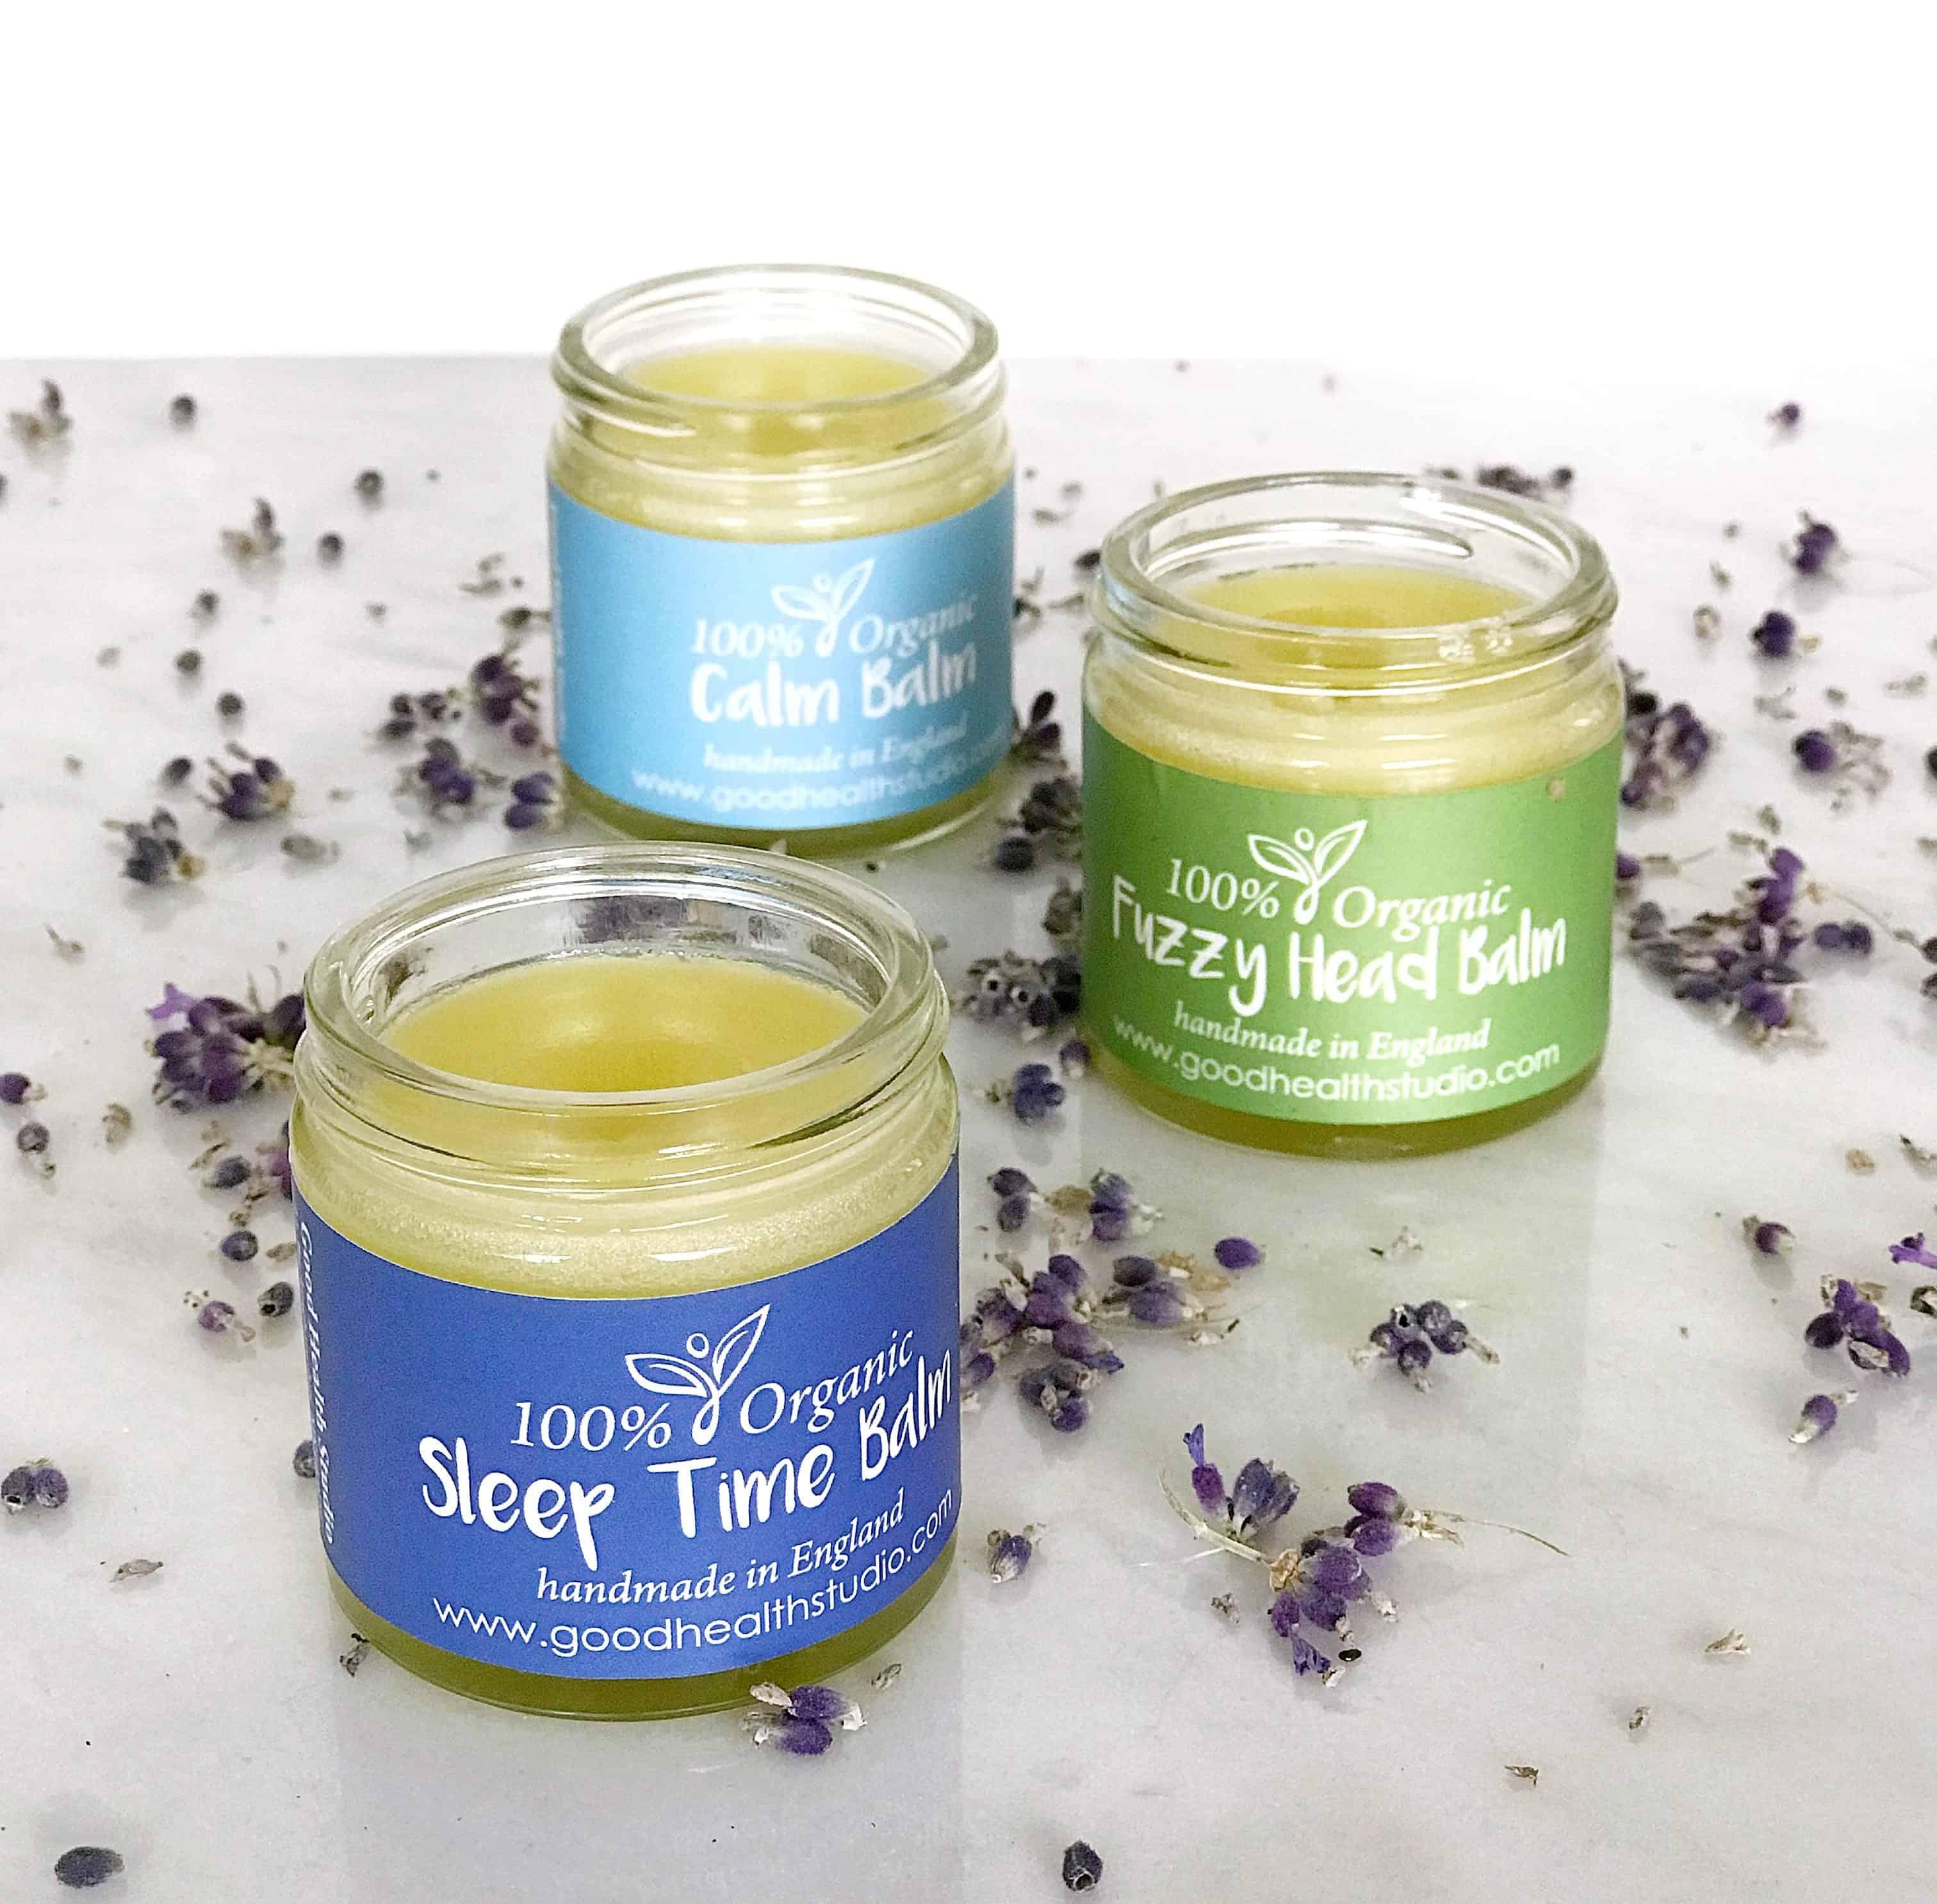 Looking after myself with Good Health Studio 100% organic aromatherapy wellness balms